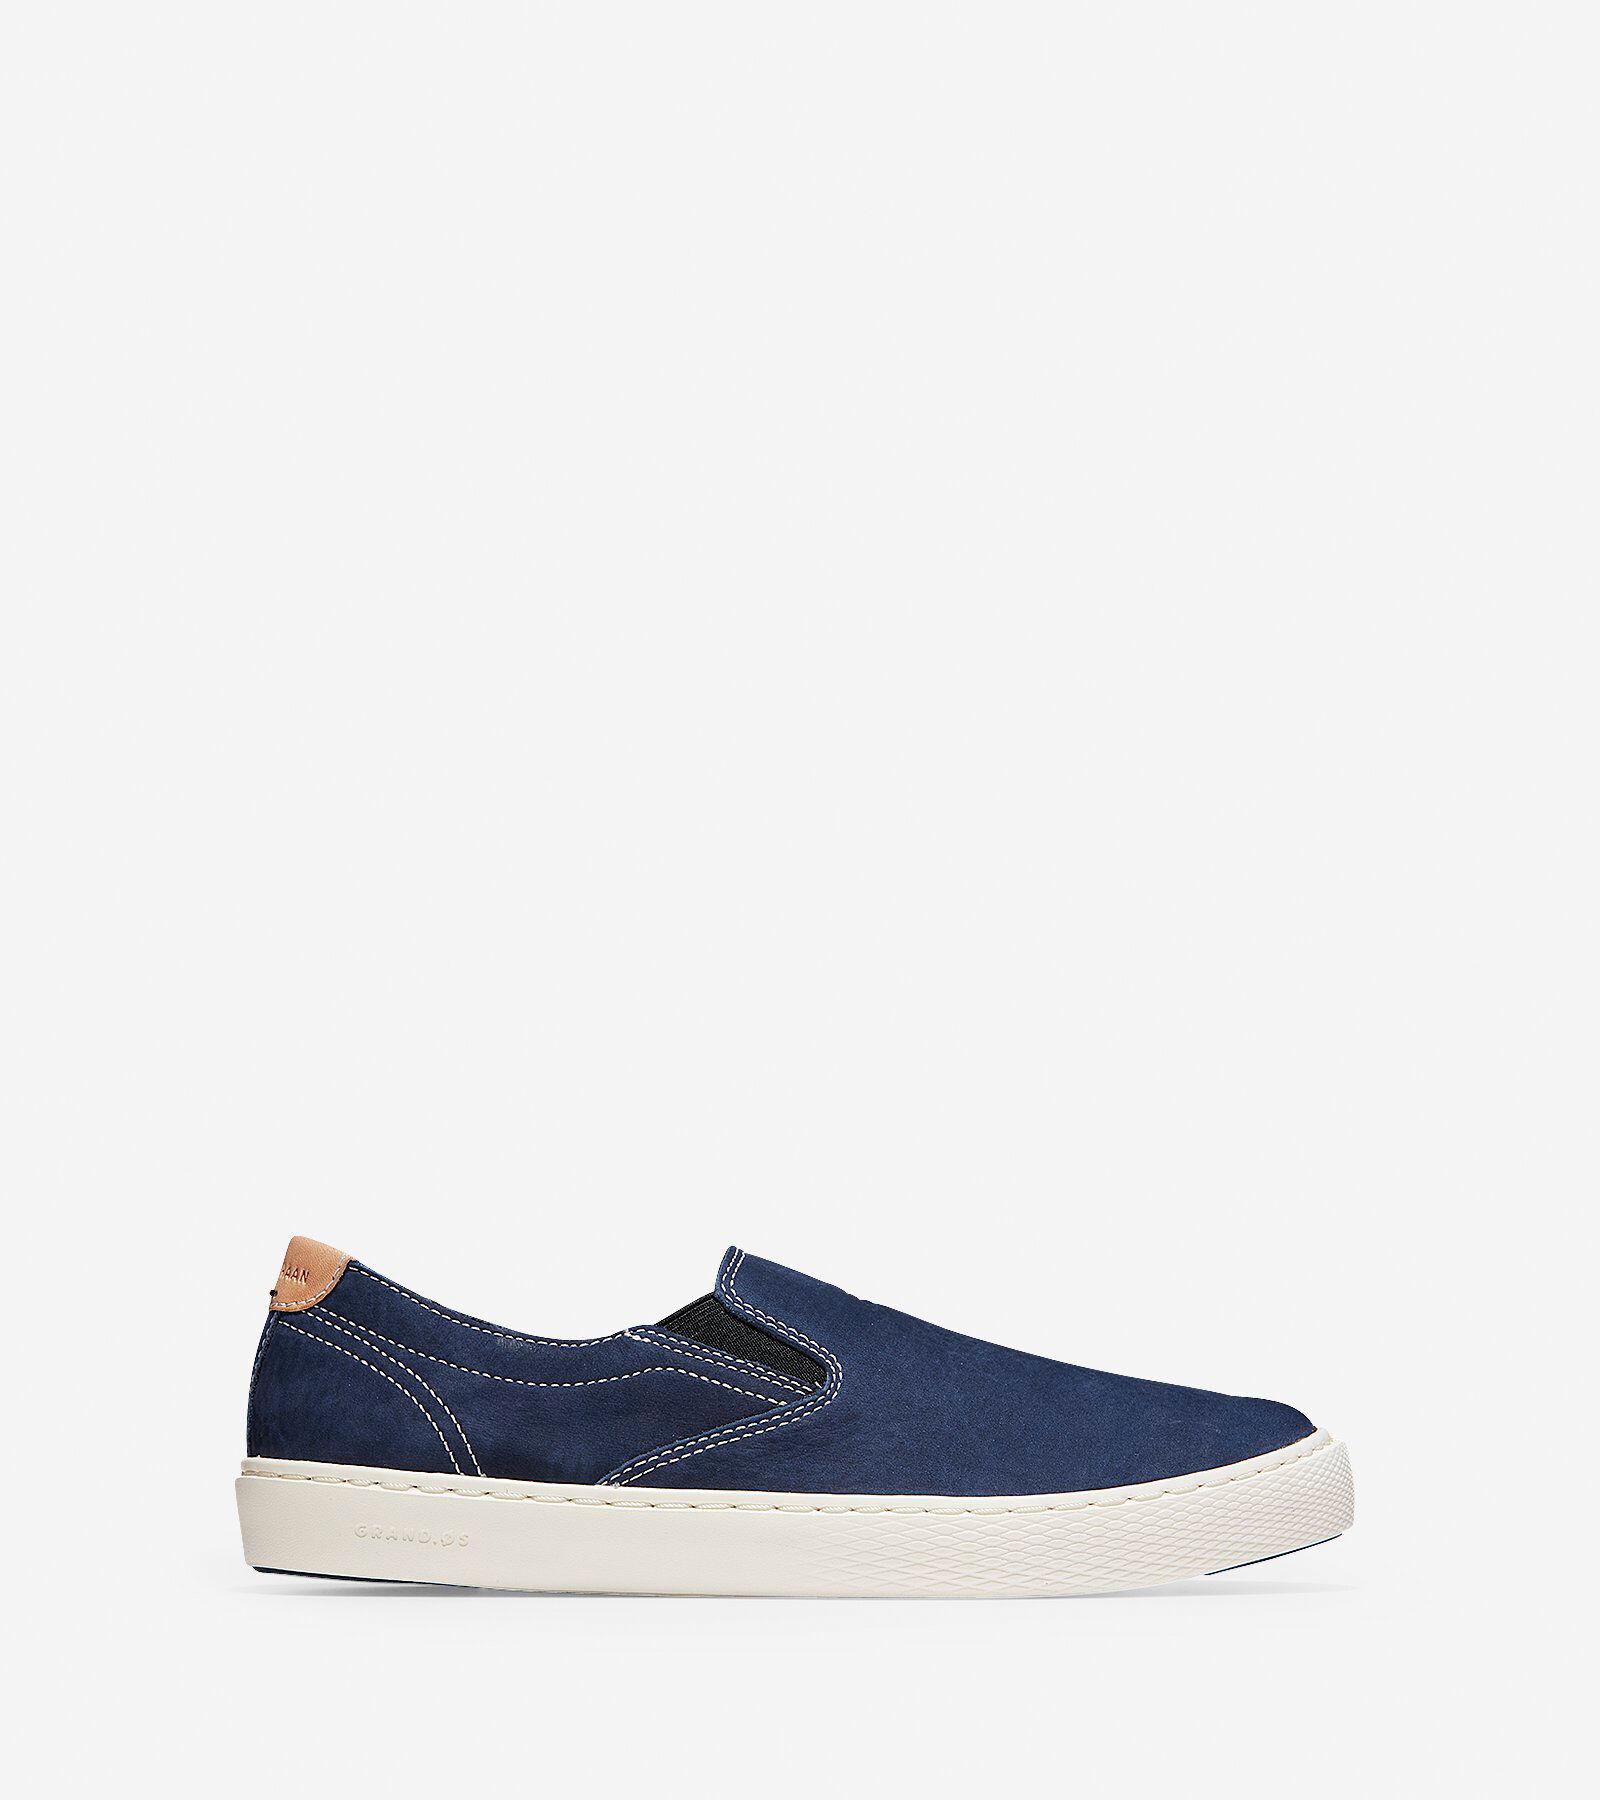 Men's GrandPrø Deck Slip-On Sneaker affordable cheap online ost release dates 2KaOQz7